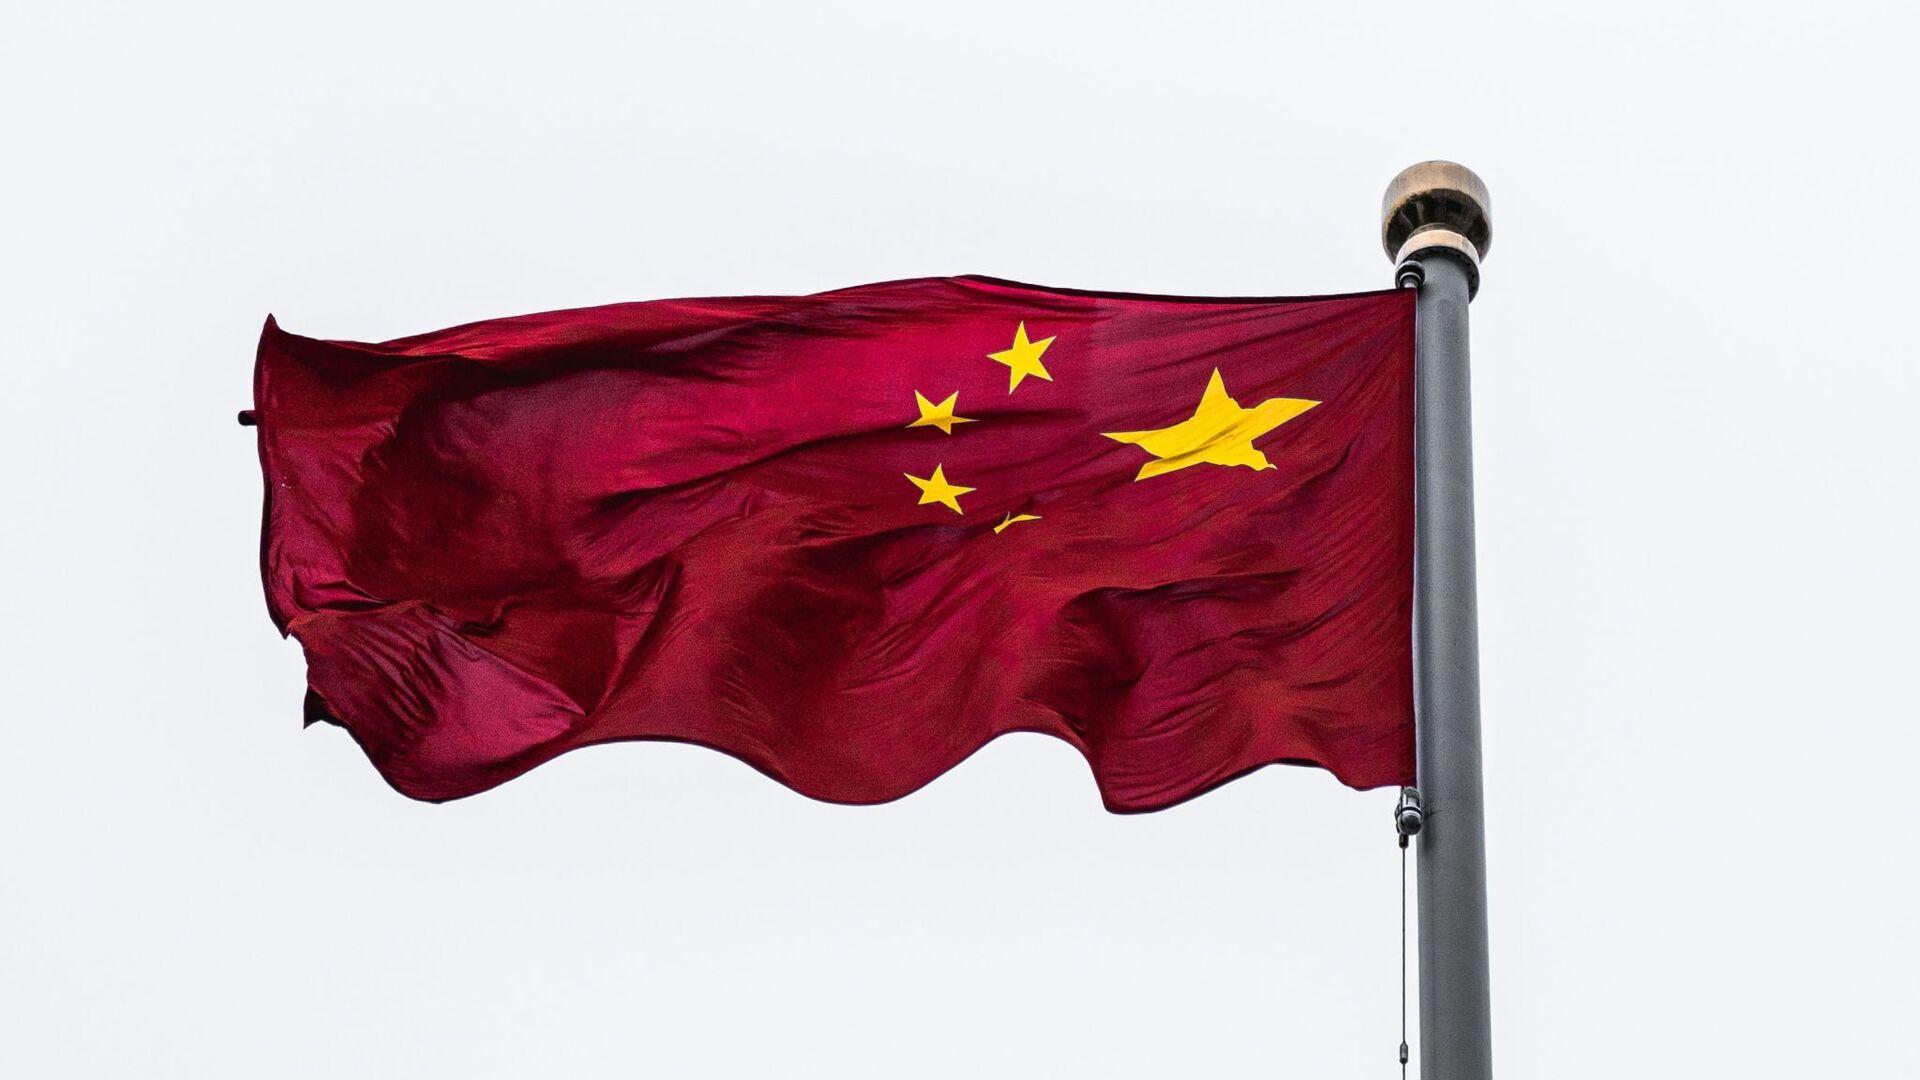 Bandera de China - Sputnik Mundo, 1920, 15.03.2021